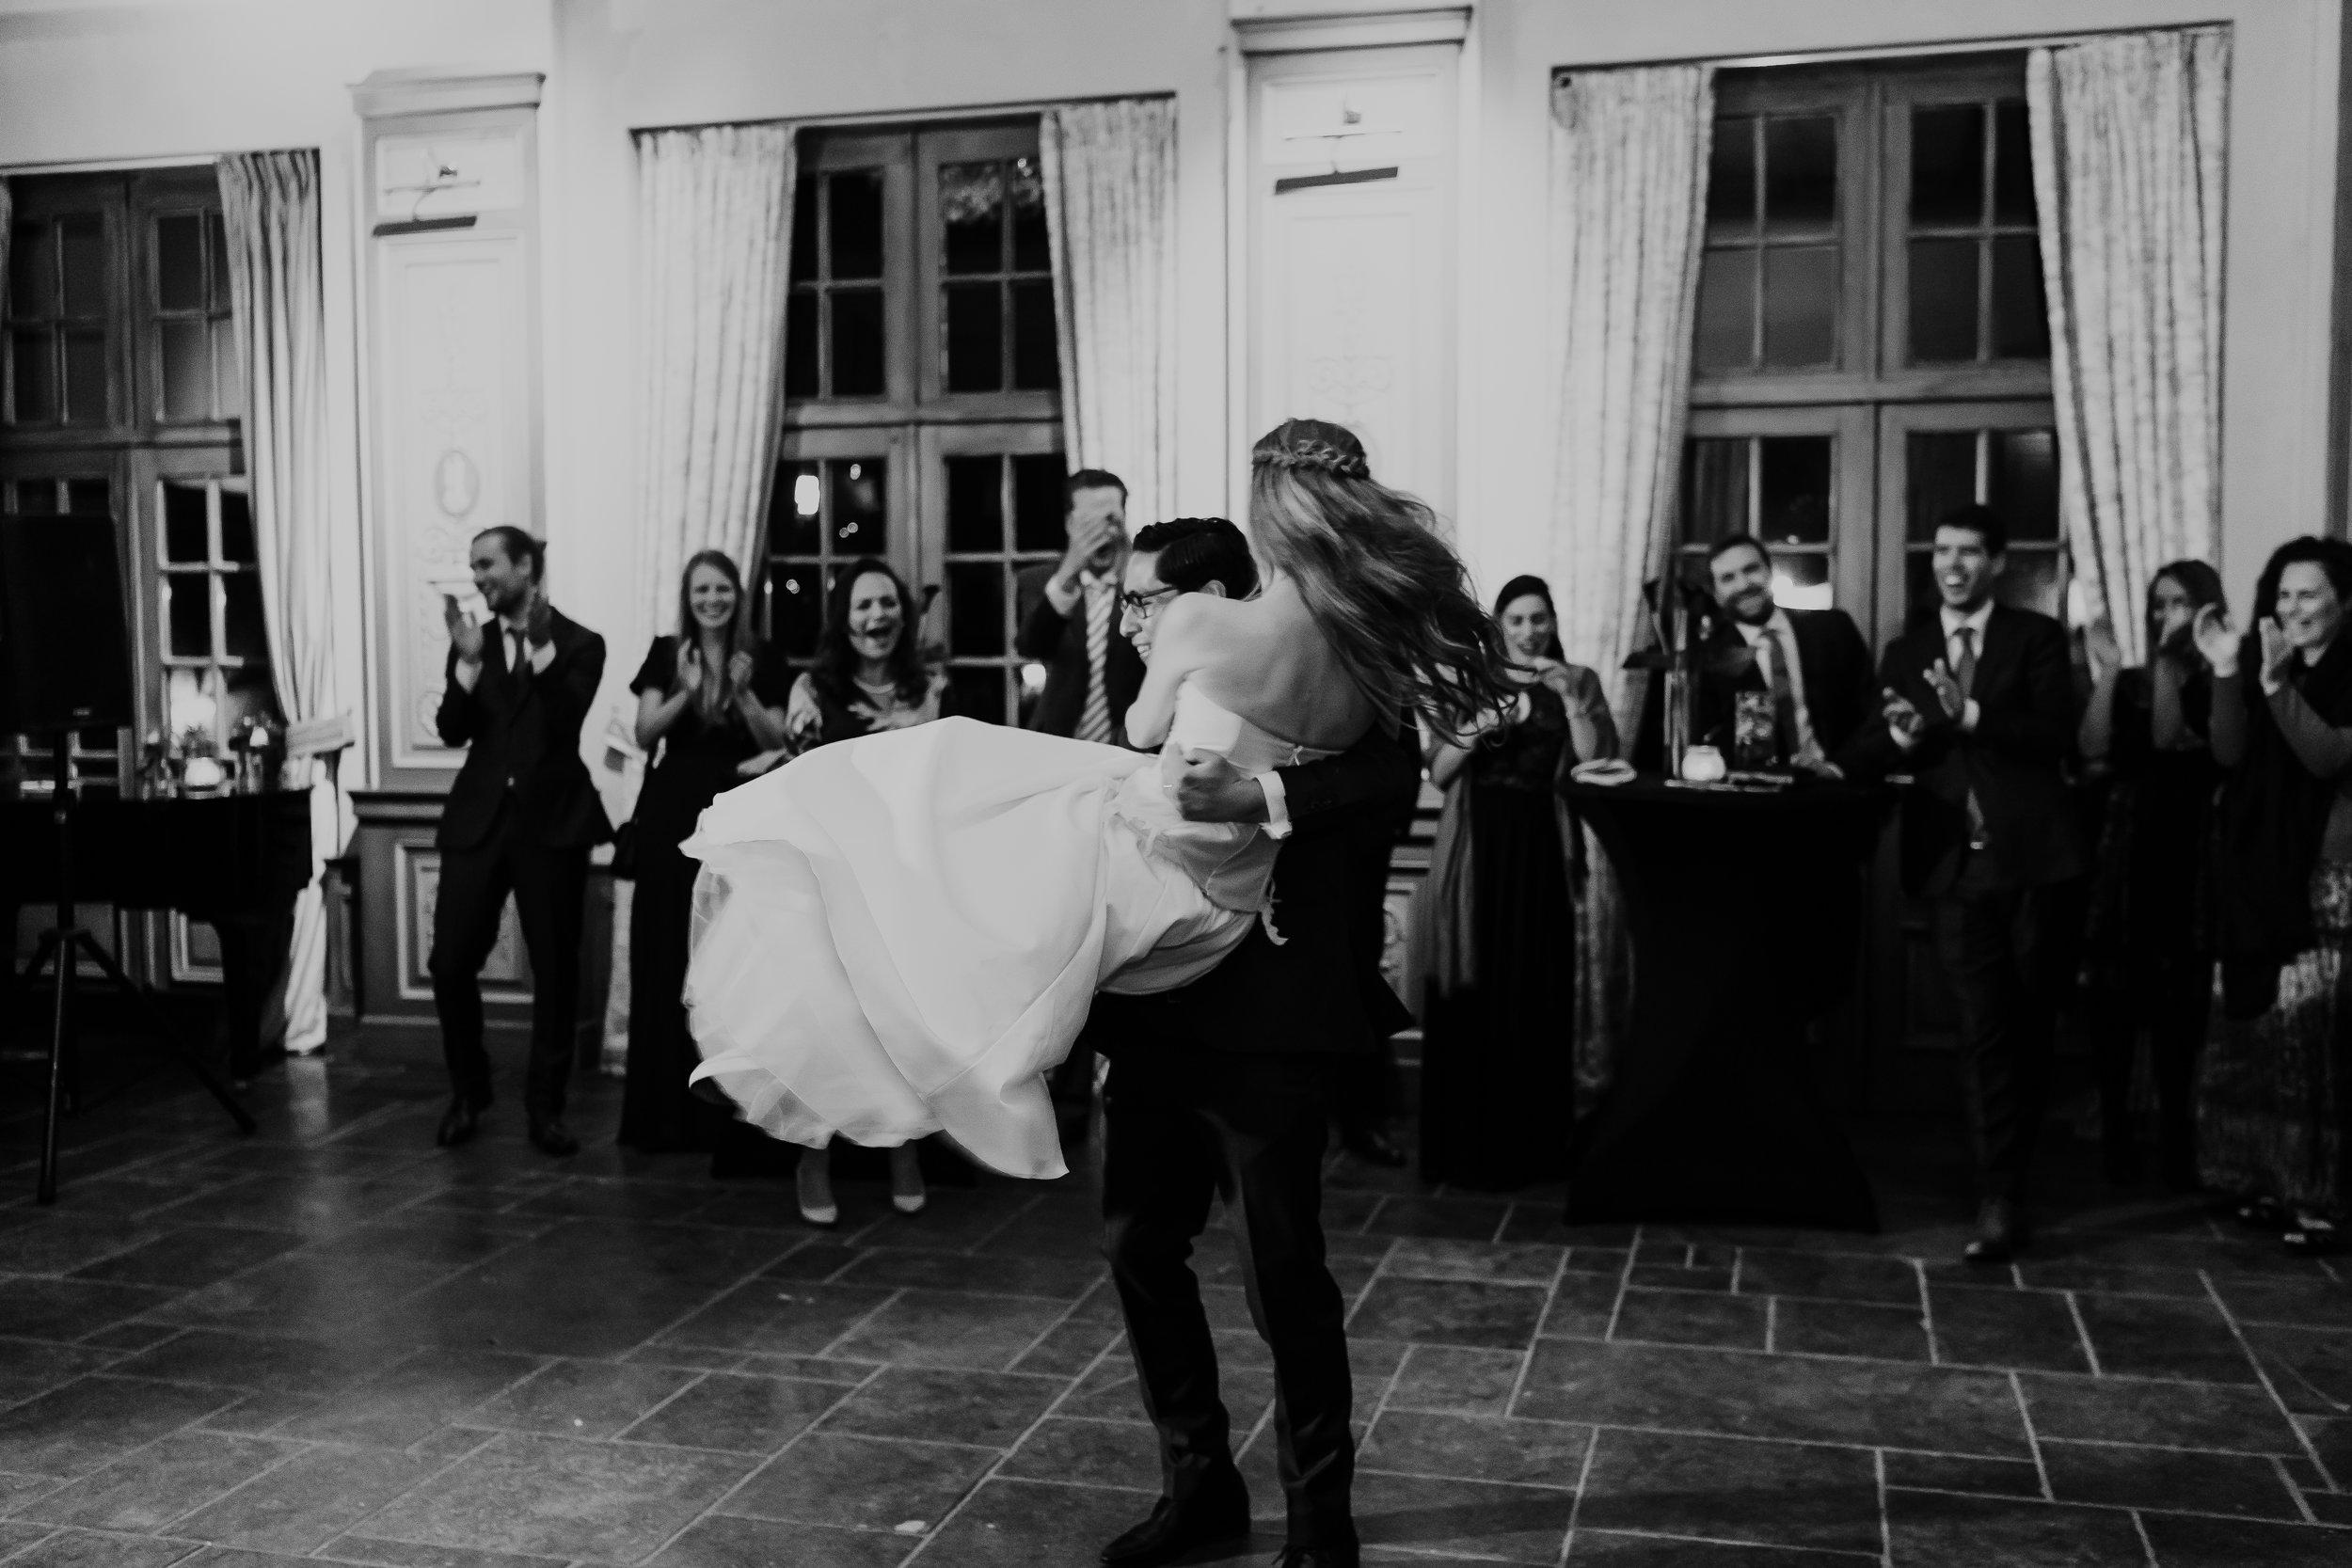 bruiloft-altembrouck-overthemoonweddings48.jpg